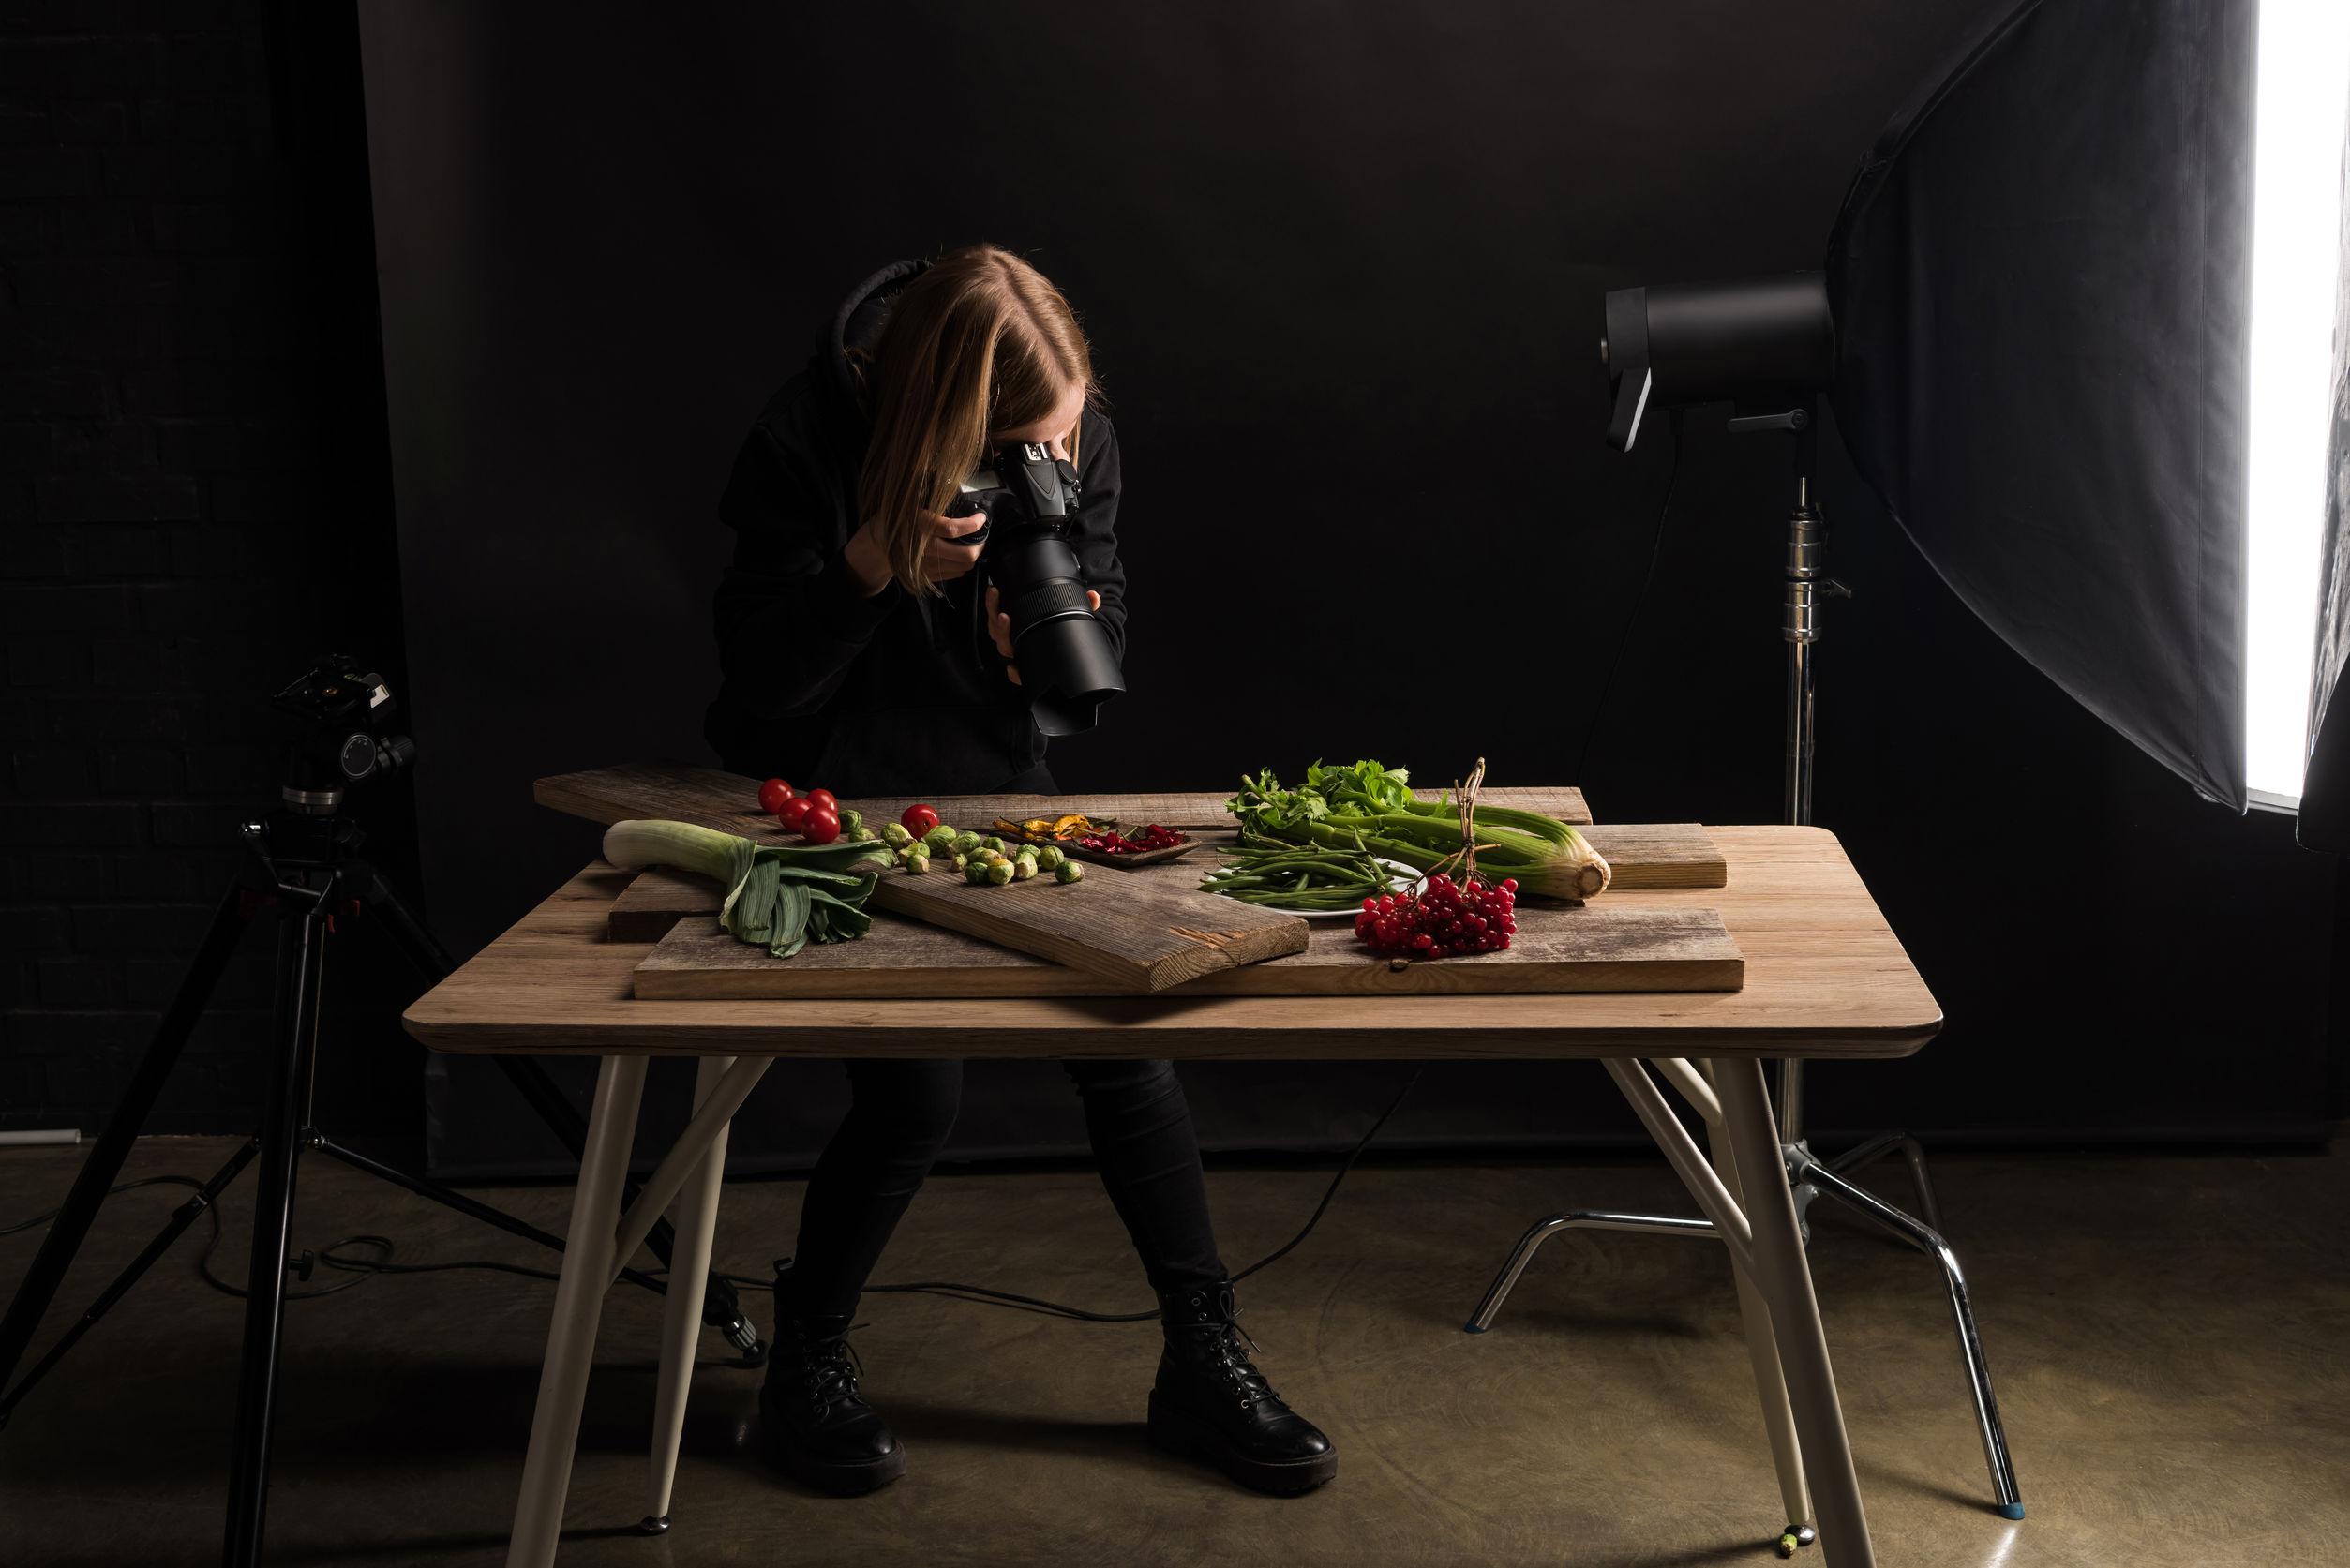 How To Build A Food Photography Setup